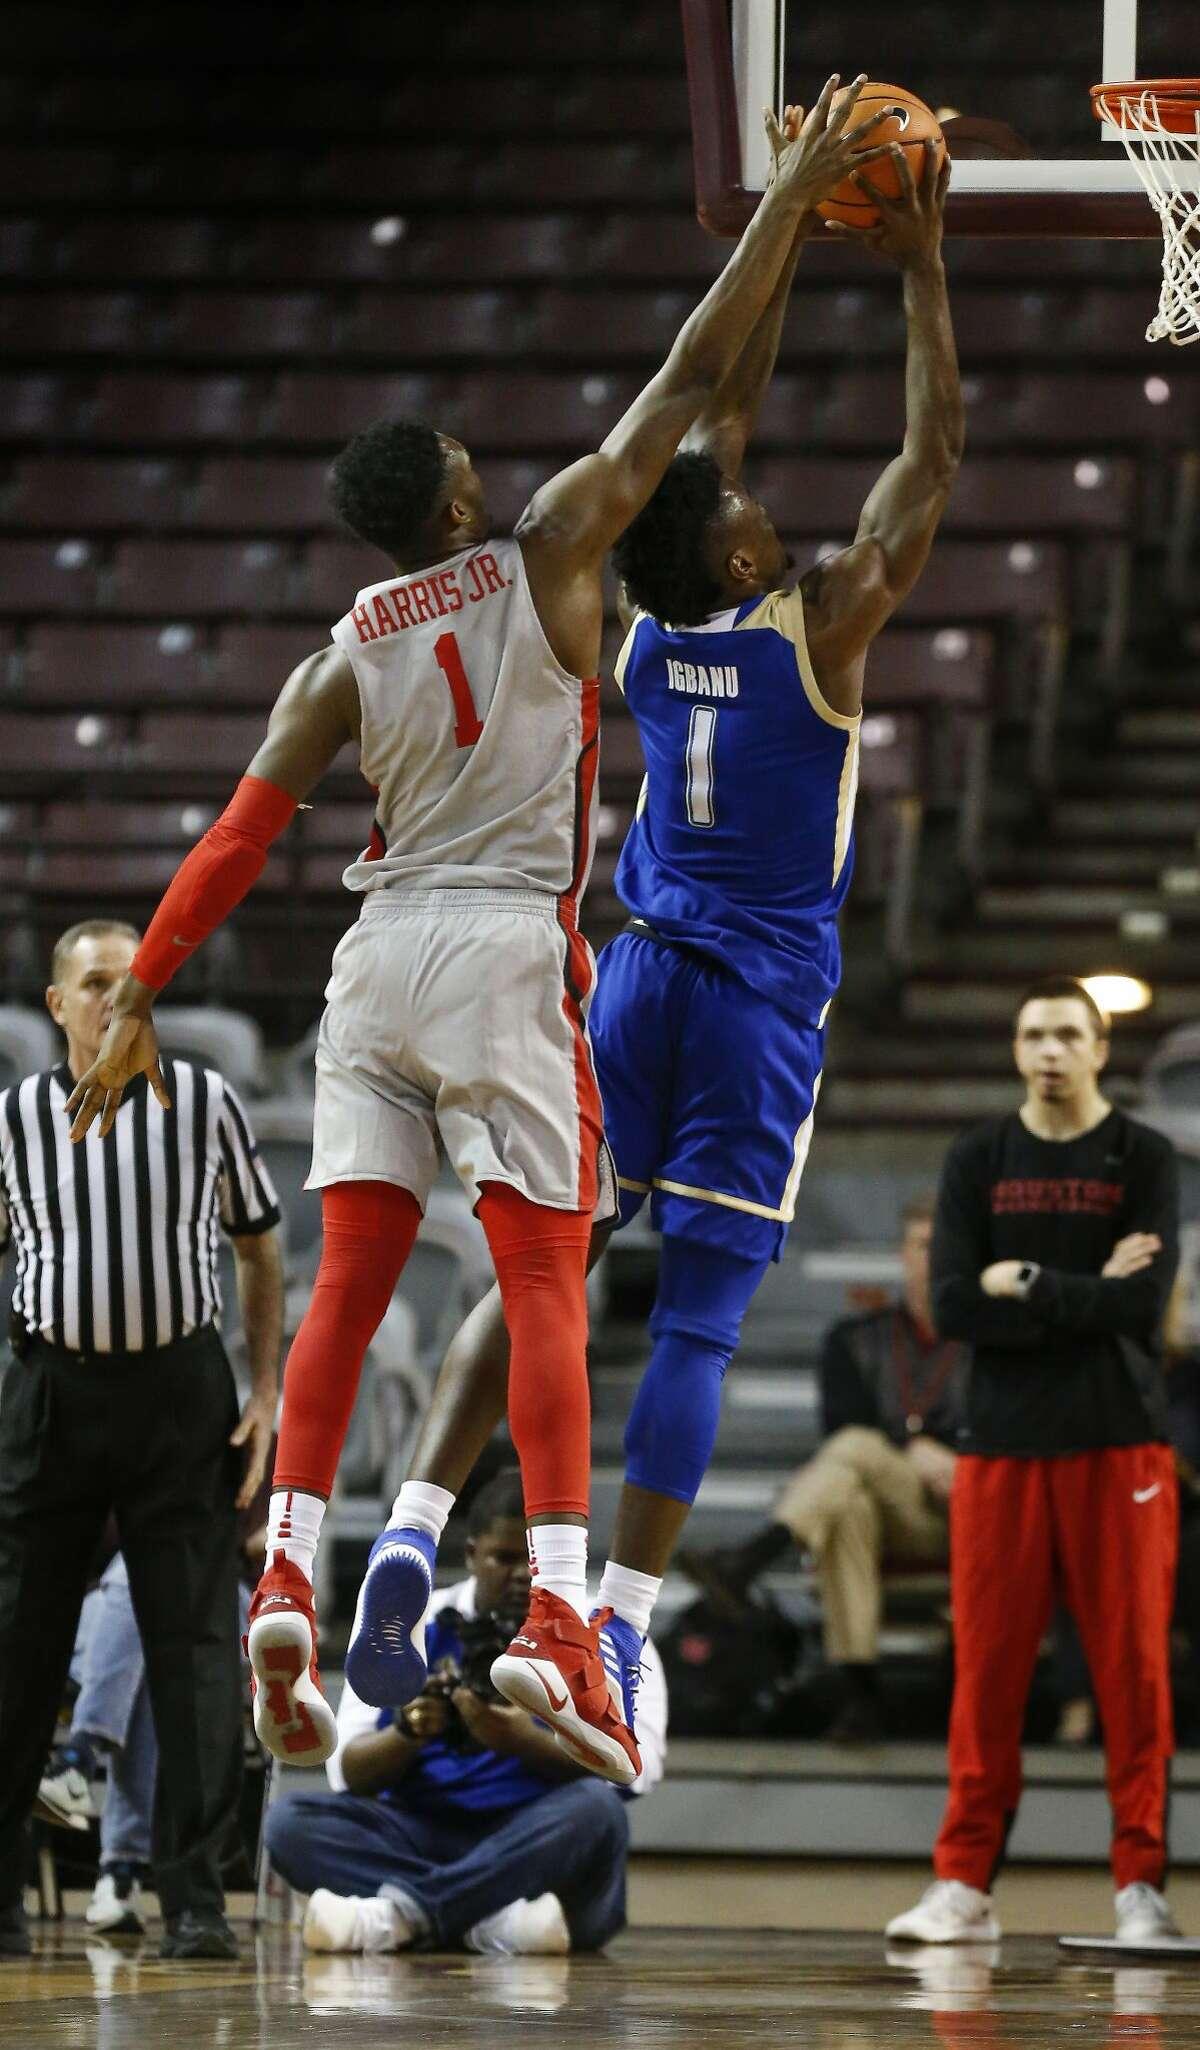 Houston center Chris Harris Jr. (1) blocks a shot by Tulsa forward Martins Igbanu (1) during first-half action at H&PE Arena, TSU Campus Thursday, Jan. 11, 2018, in Houston. ( Steve Gonzales / Houston Chronicle )